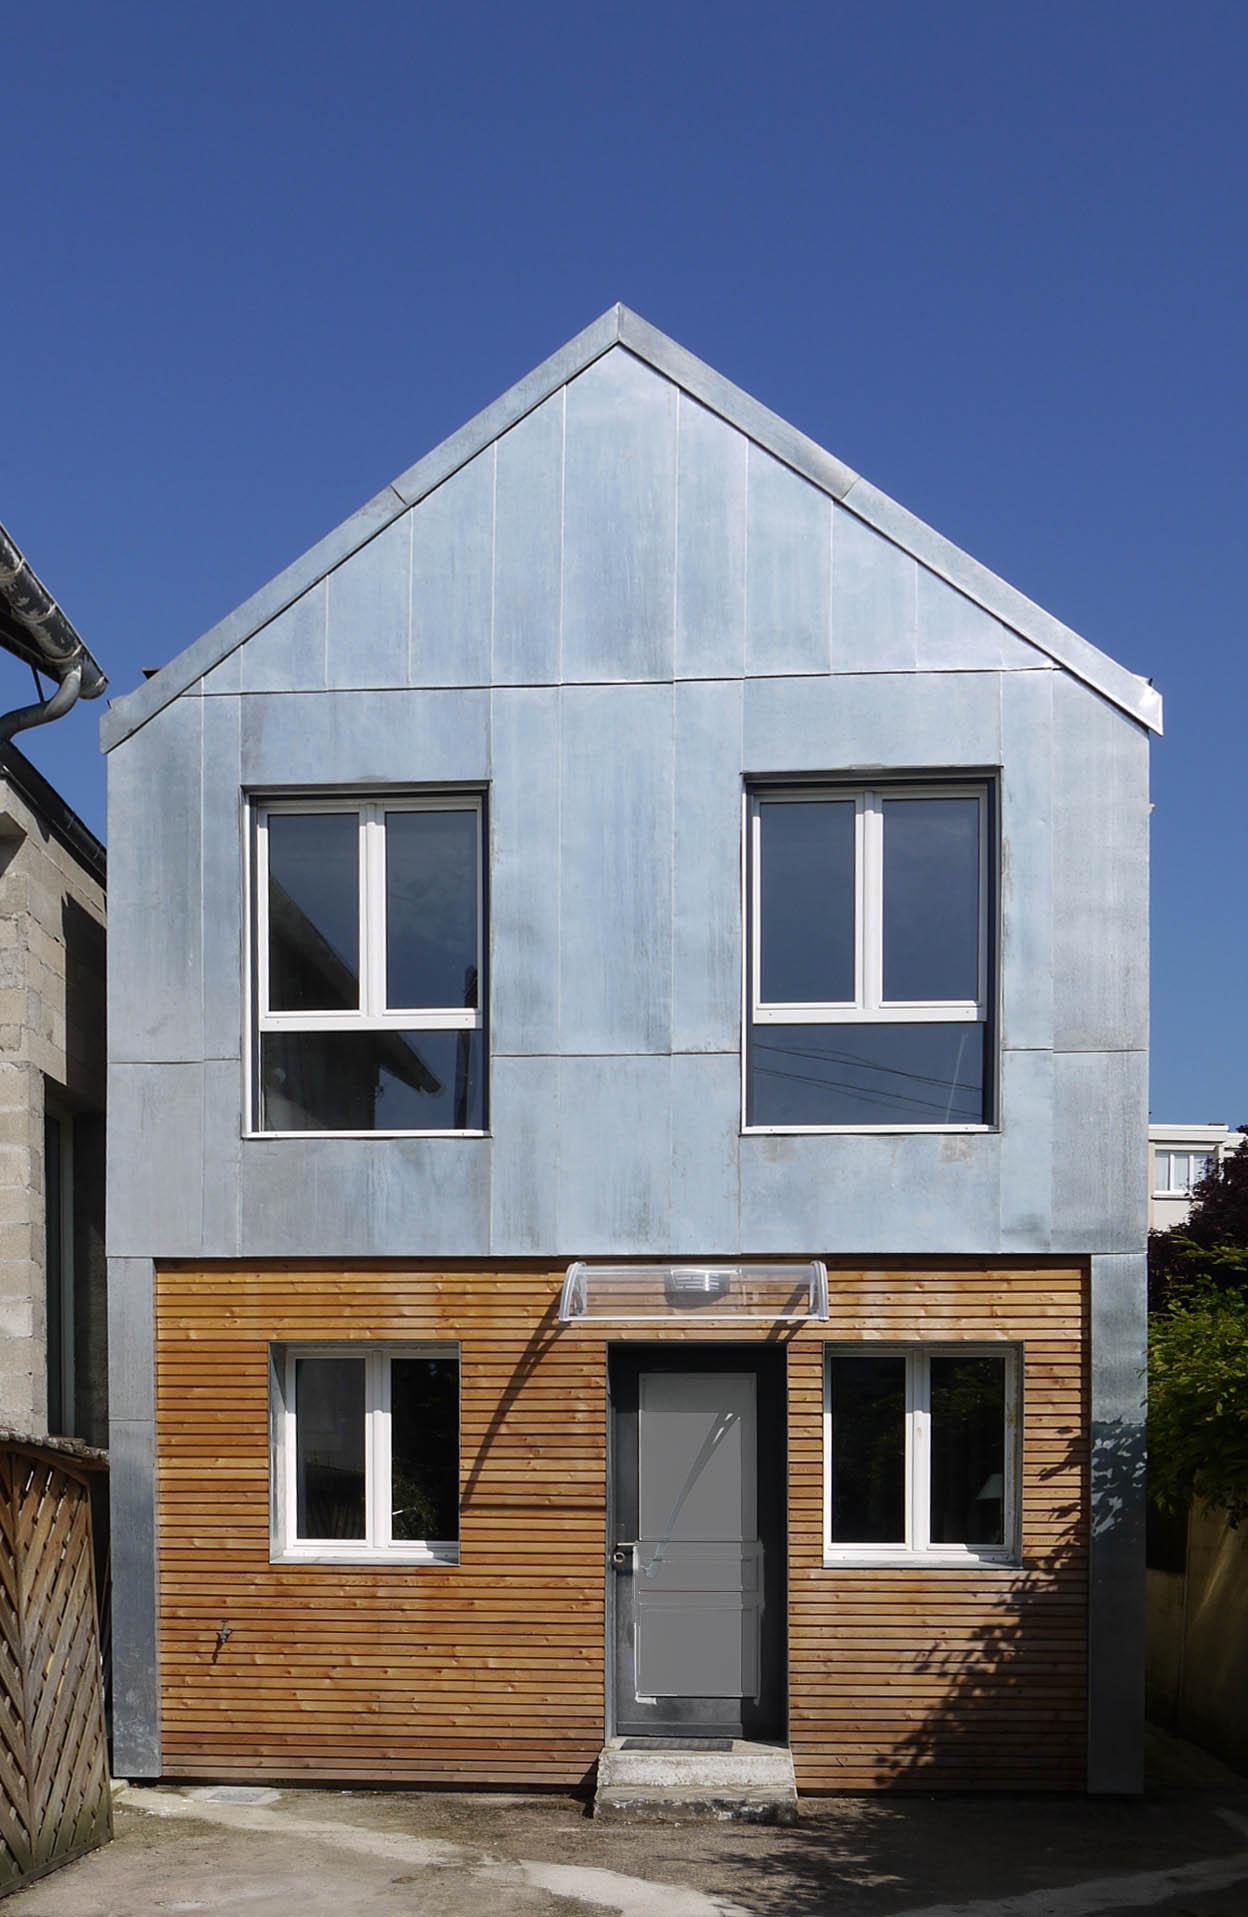 Laurence cornouextension maison individuelle antony 92 for Garage antony 92